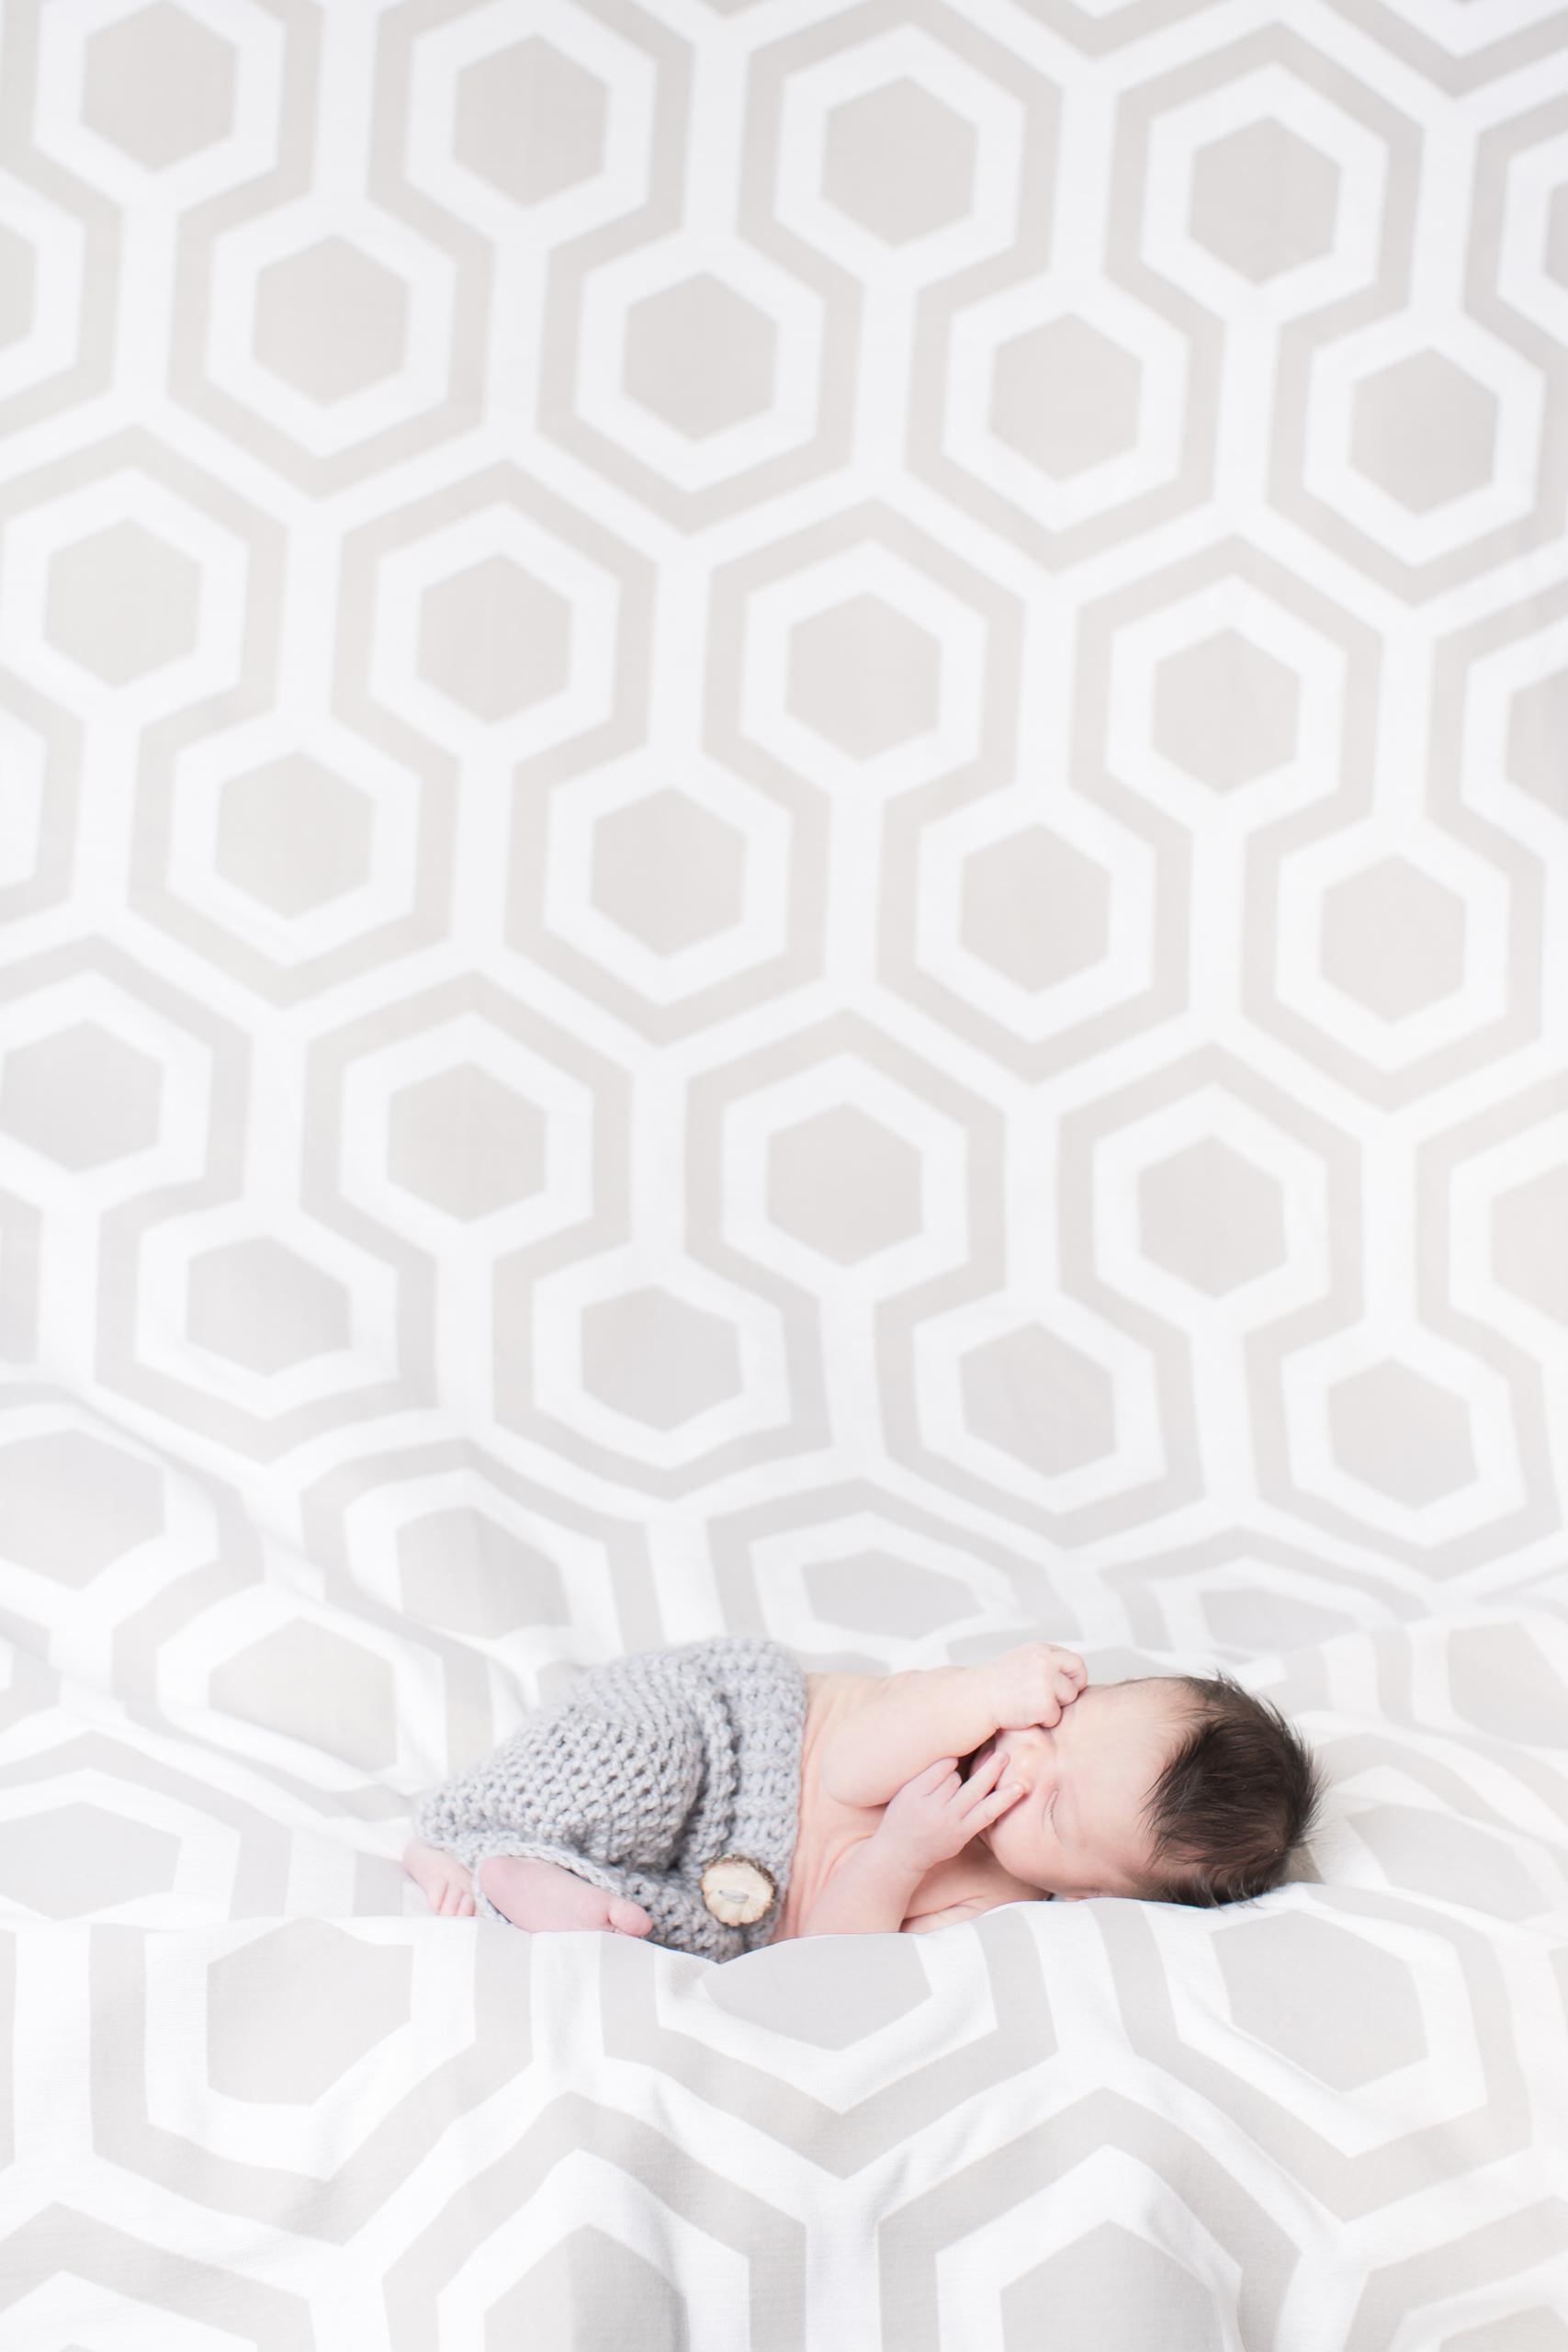 06 modern newborn baby boy in kint bottoms modern hexagon backdrop studio photography session.jpg